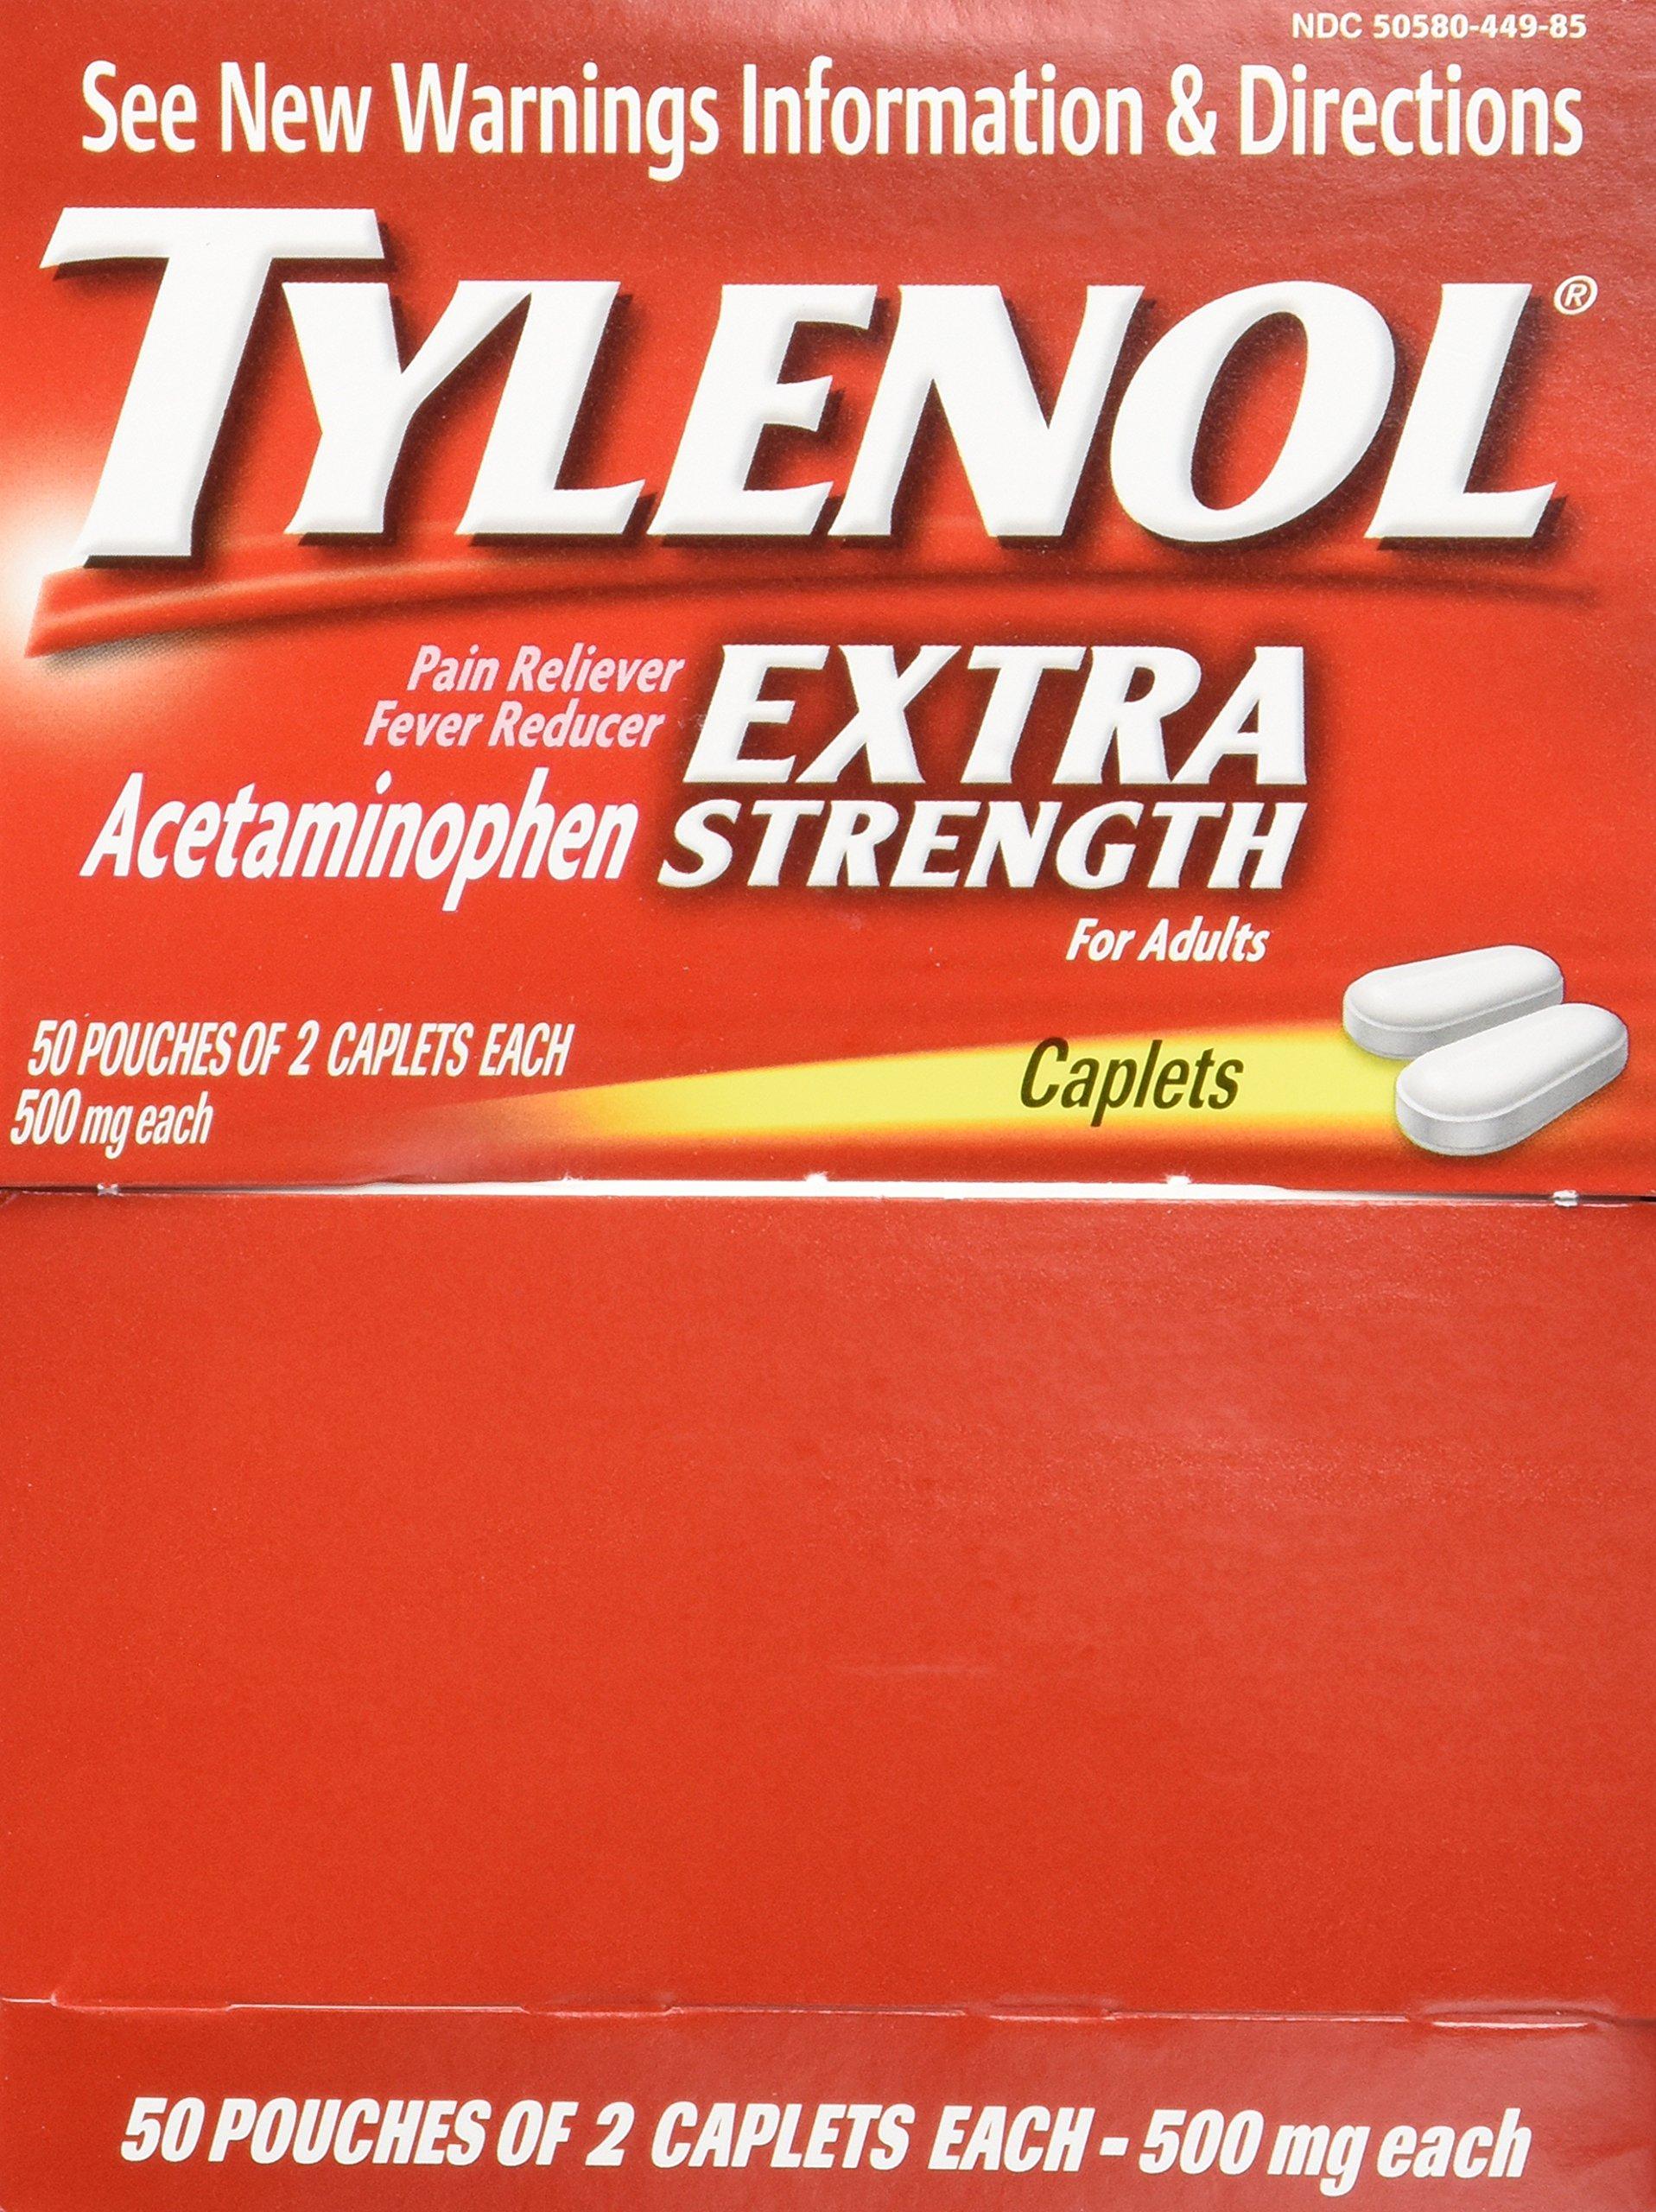 Tylenol(R) Extra-Strength, 2-Caplet Dosage, 100 caplets per box (Pack of 2)500mg each